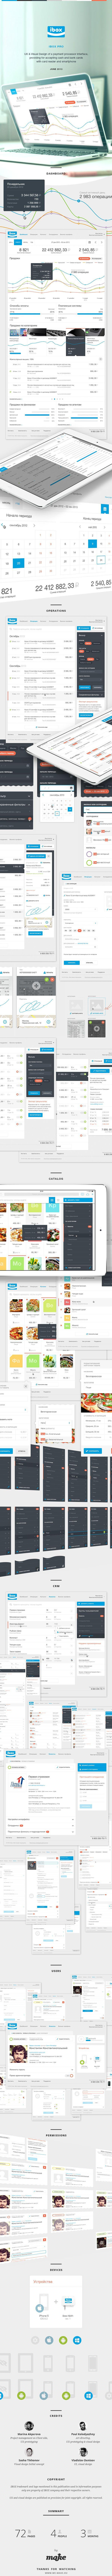 IBOX Pro on Behance #ui #interface #web #mobile